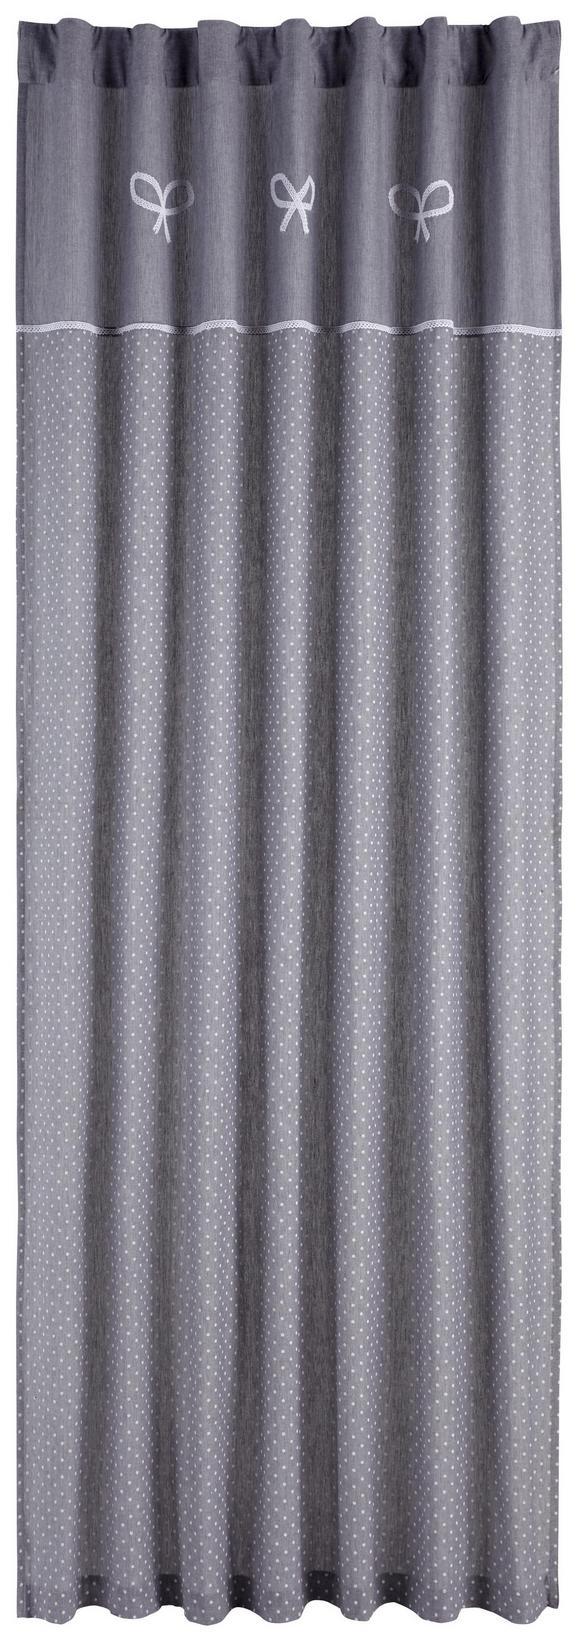 Schlaufenschal Elisabeth Grau 140x245cm - Grau, ROMANTIK / LANDHAUS, Textil (140/245cm) - ZANDIARA